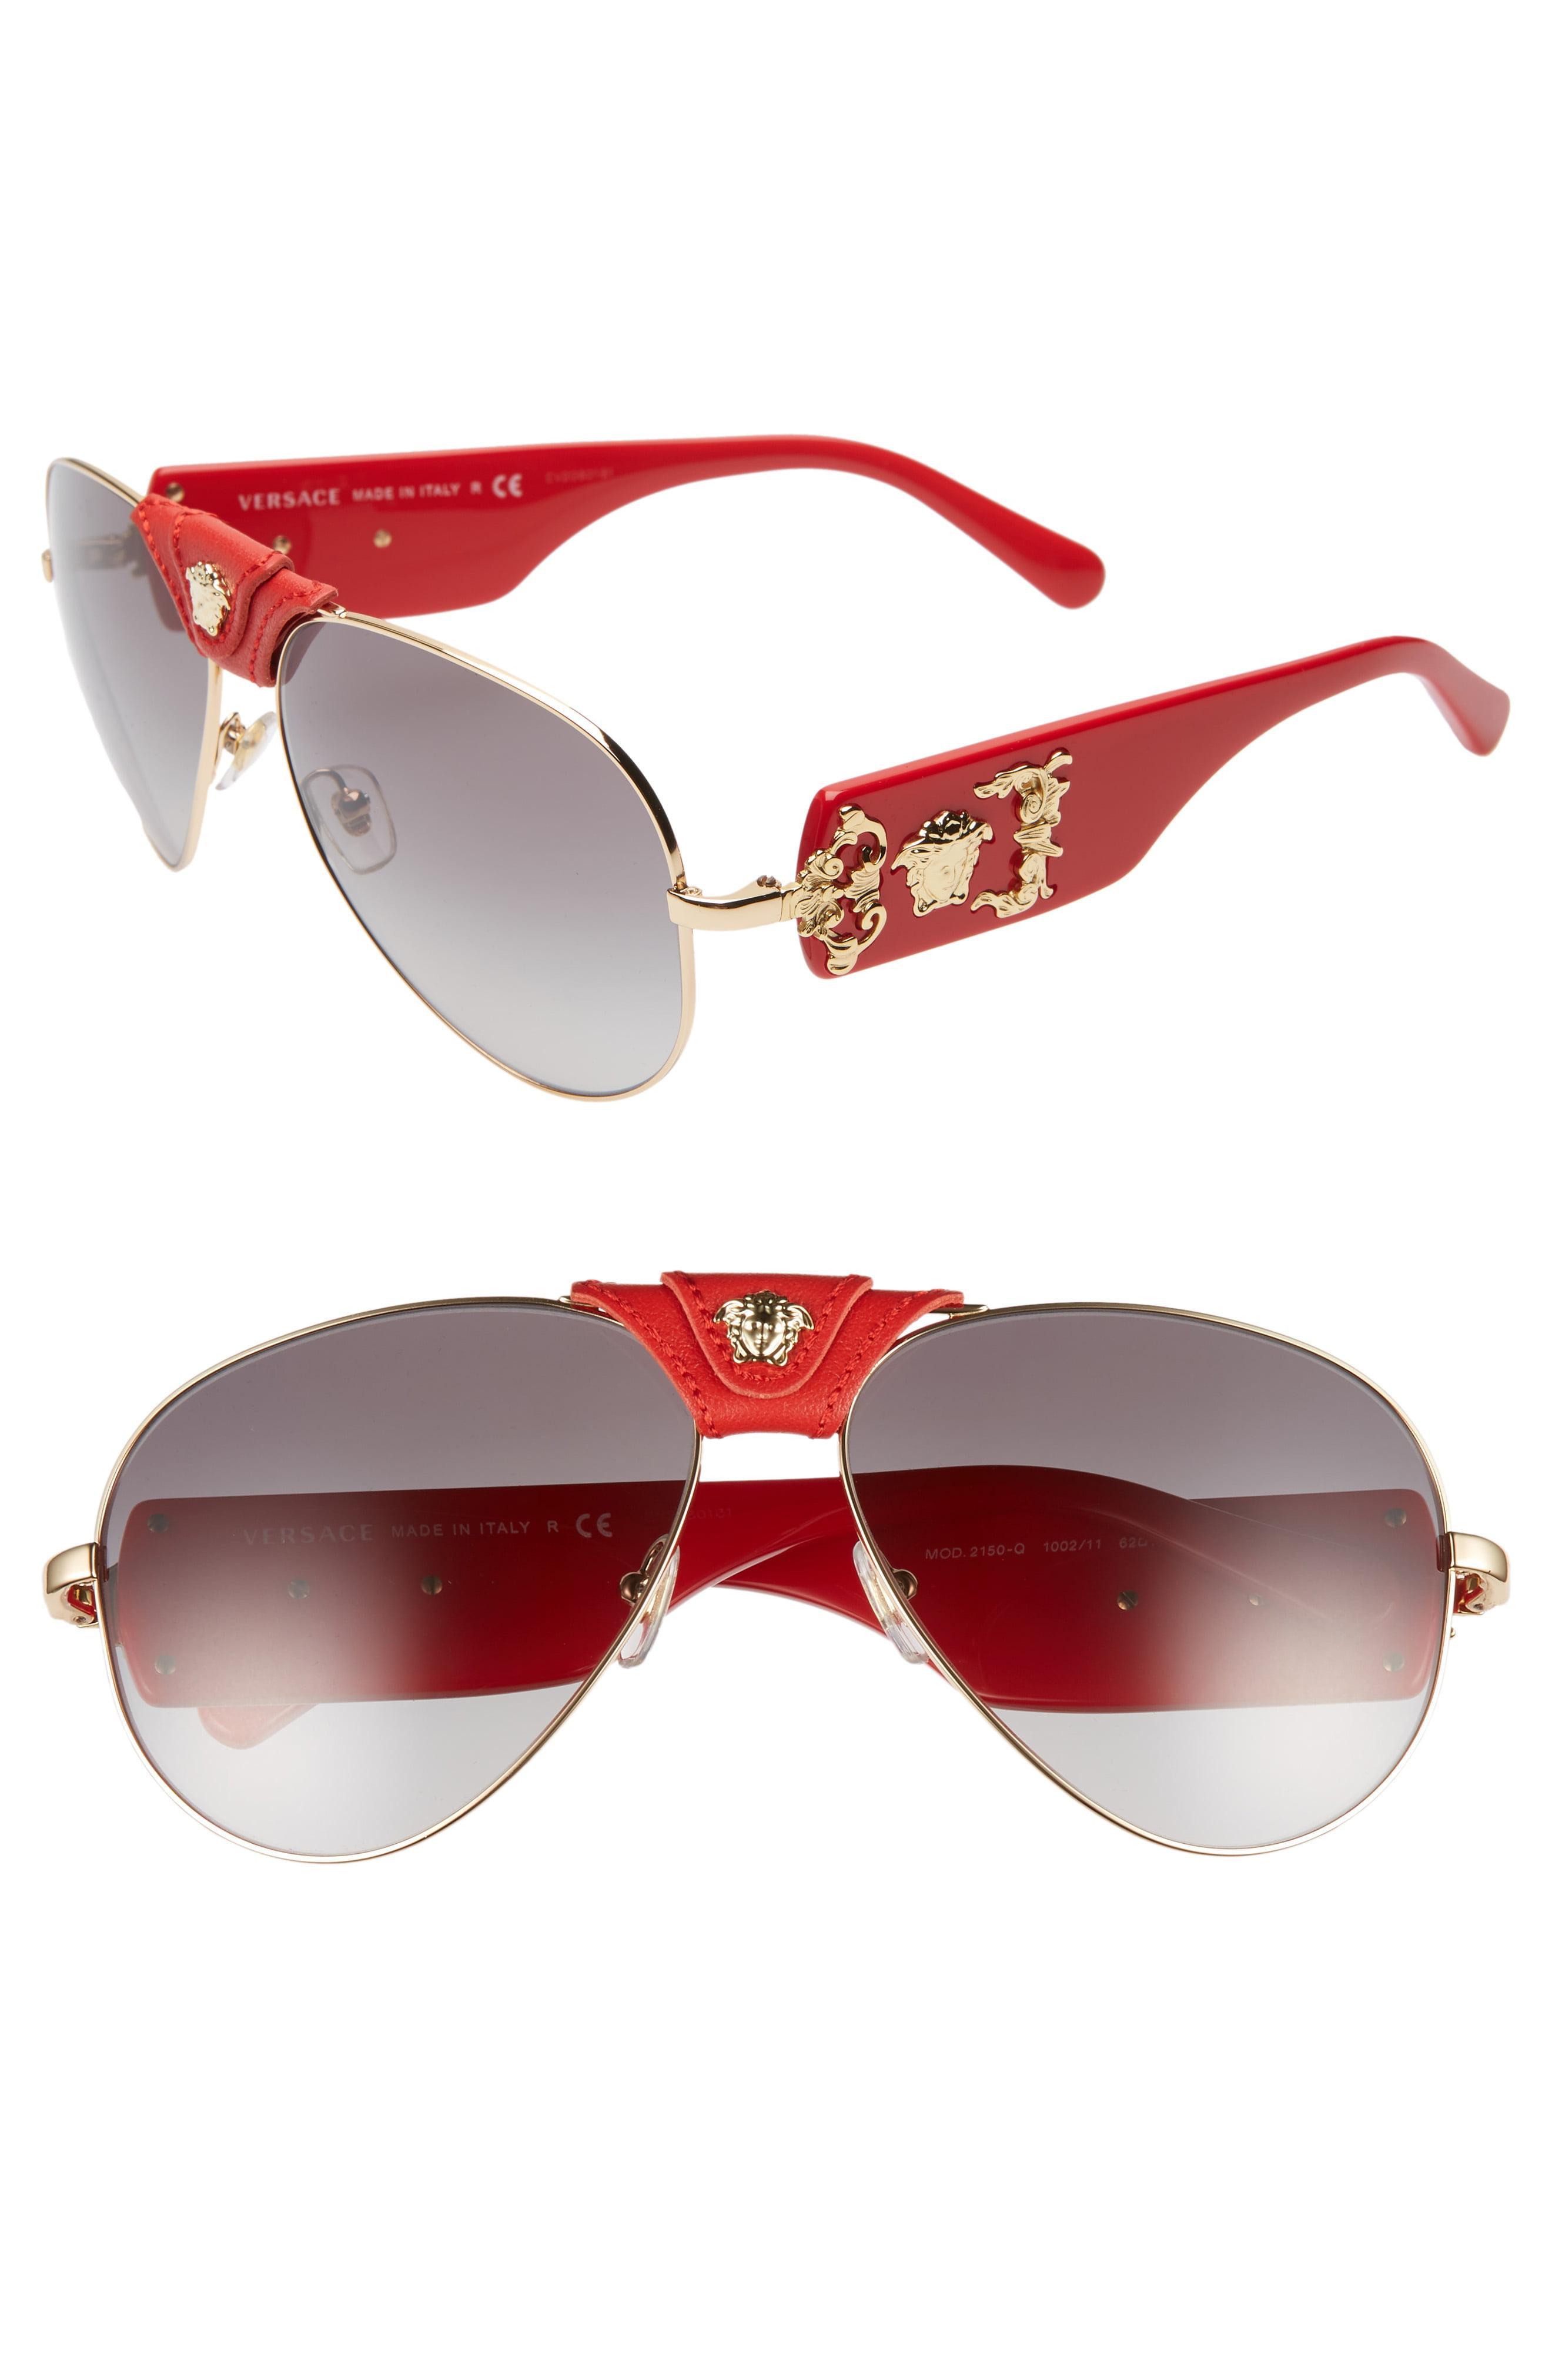 b31acd1cdea7 Lyst - Versace Medusa 62mm Aviator Sunglasses in Gray